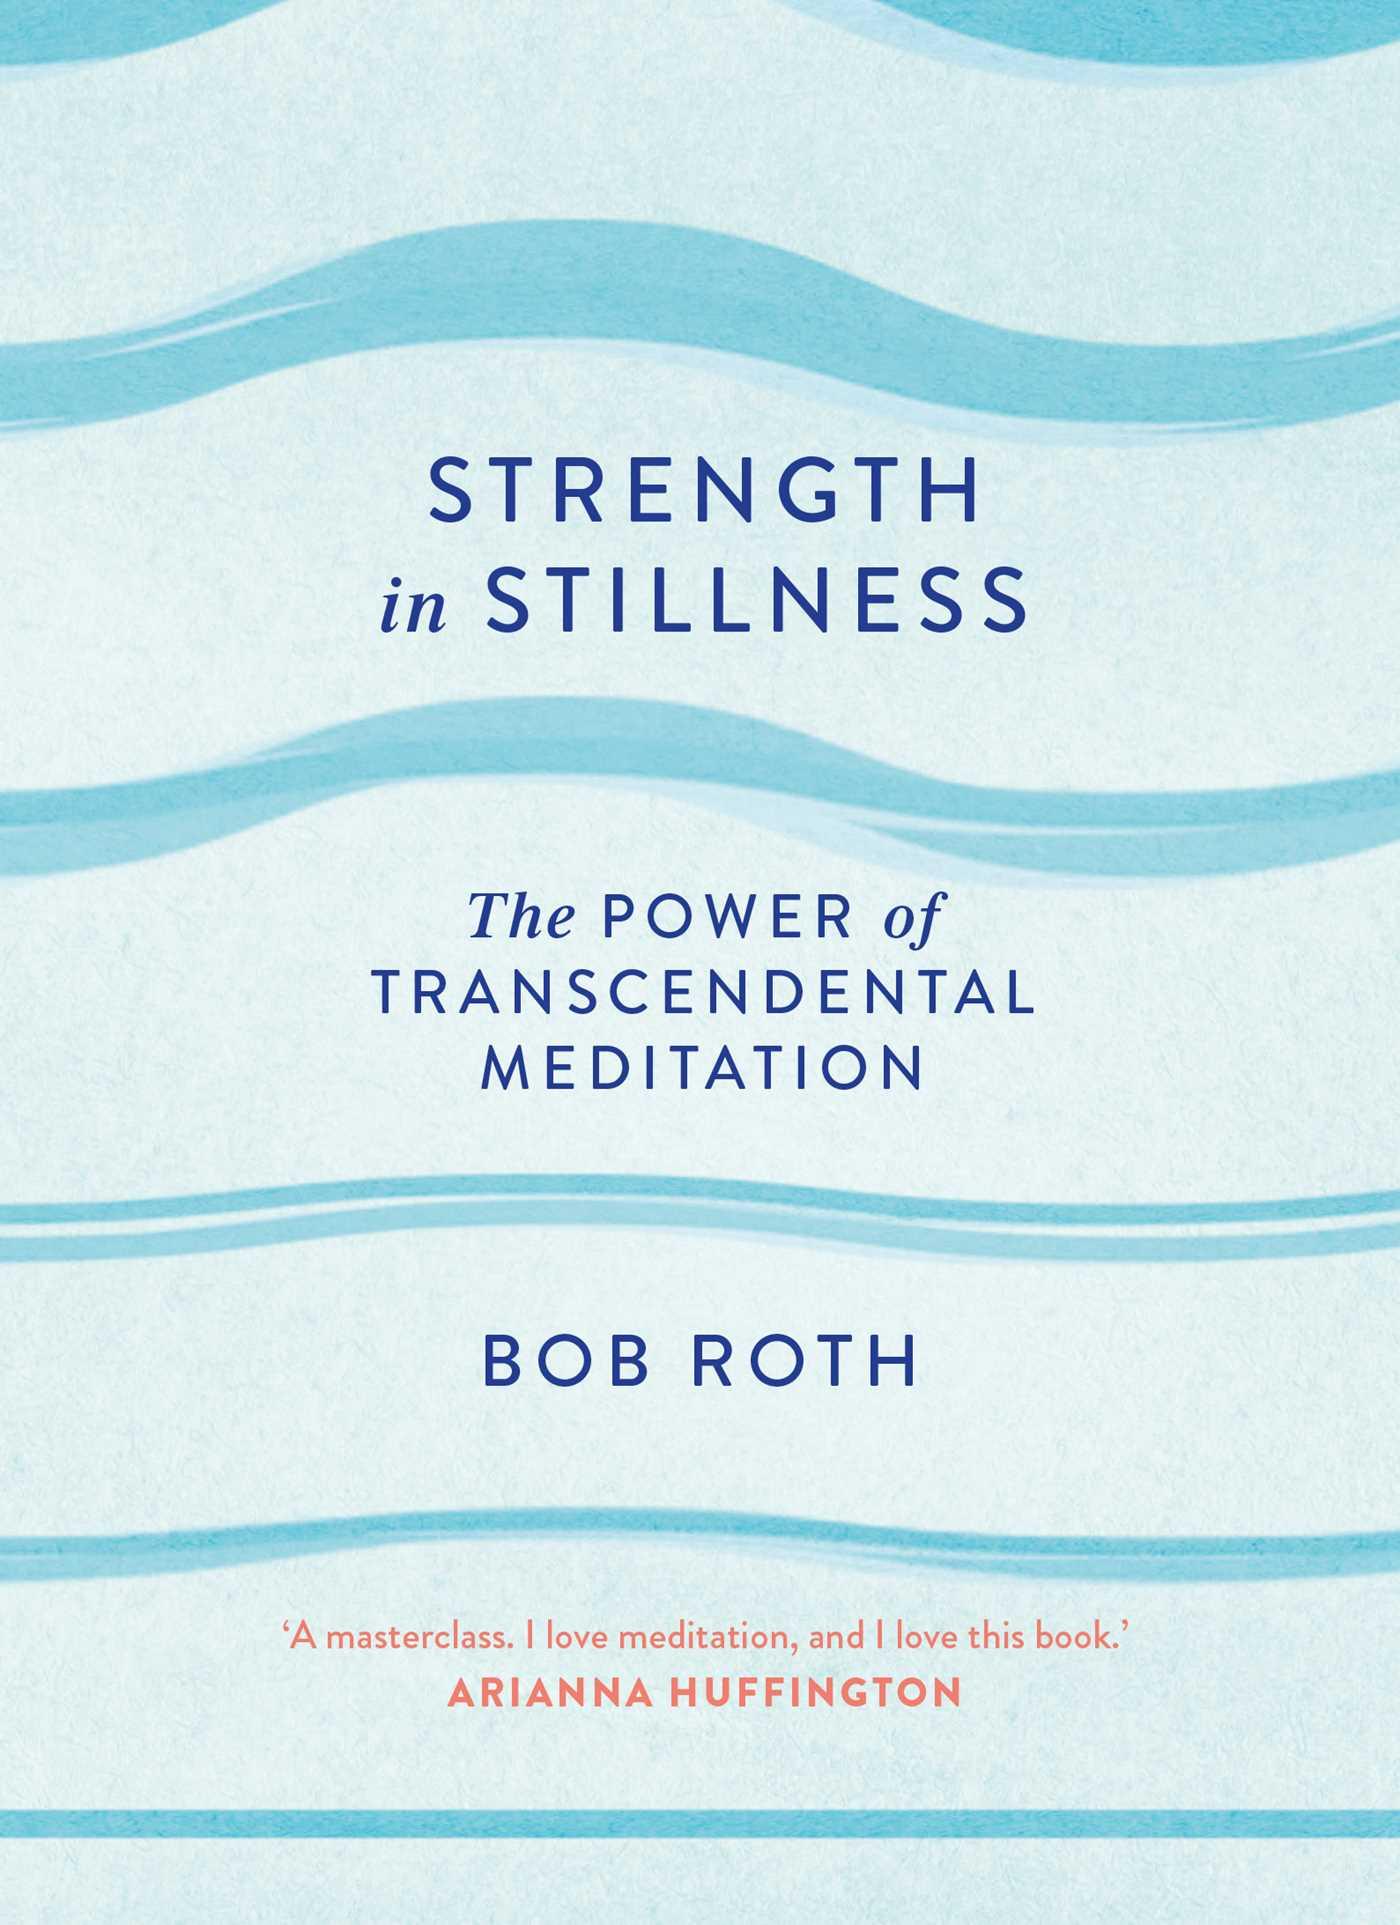 strength-in-stillness-9781471161643_hr.jpg